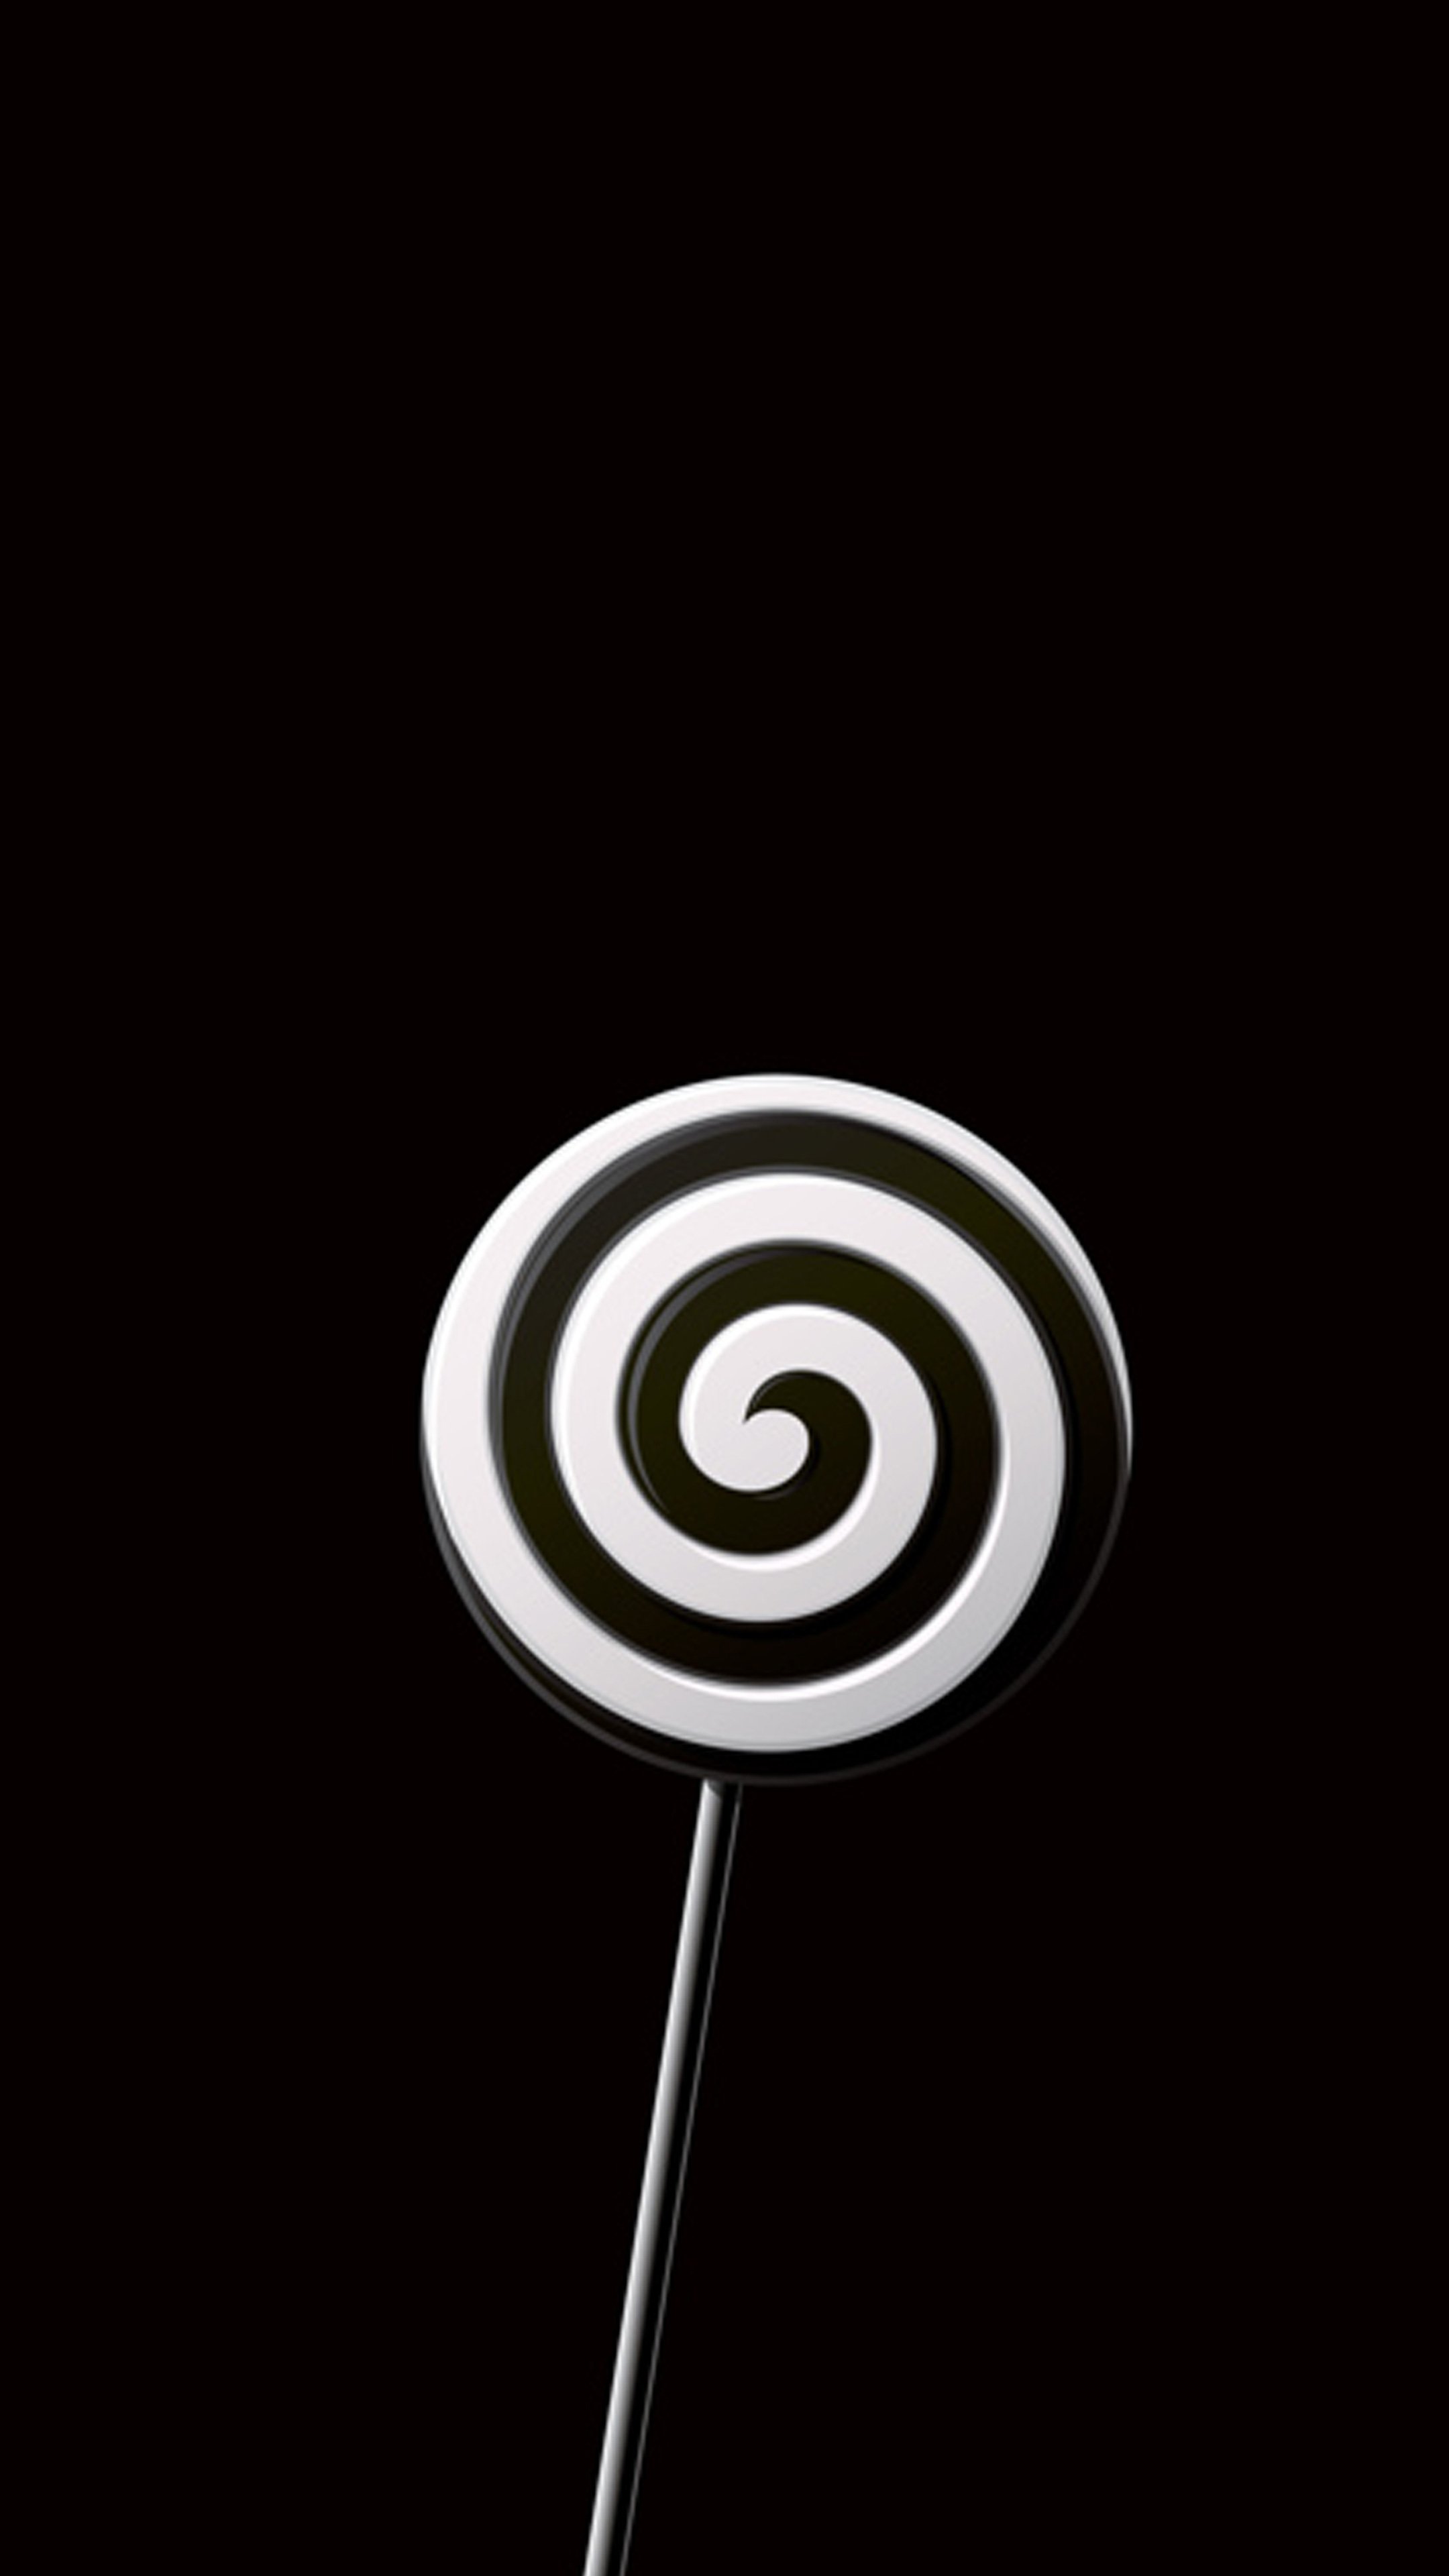 Lollipop Mobile Wallpaper